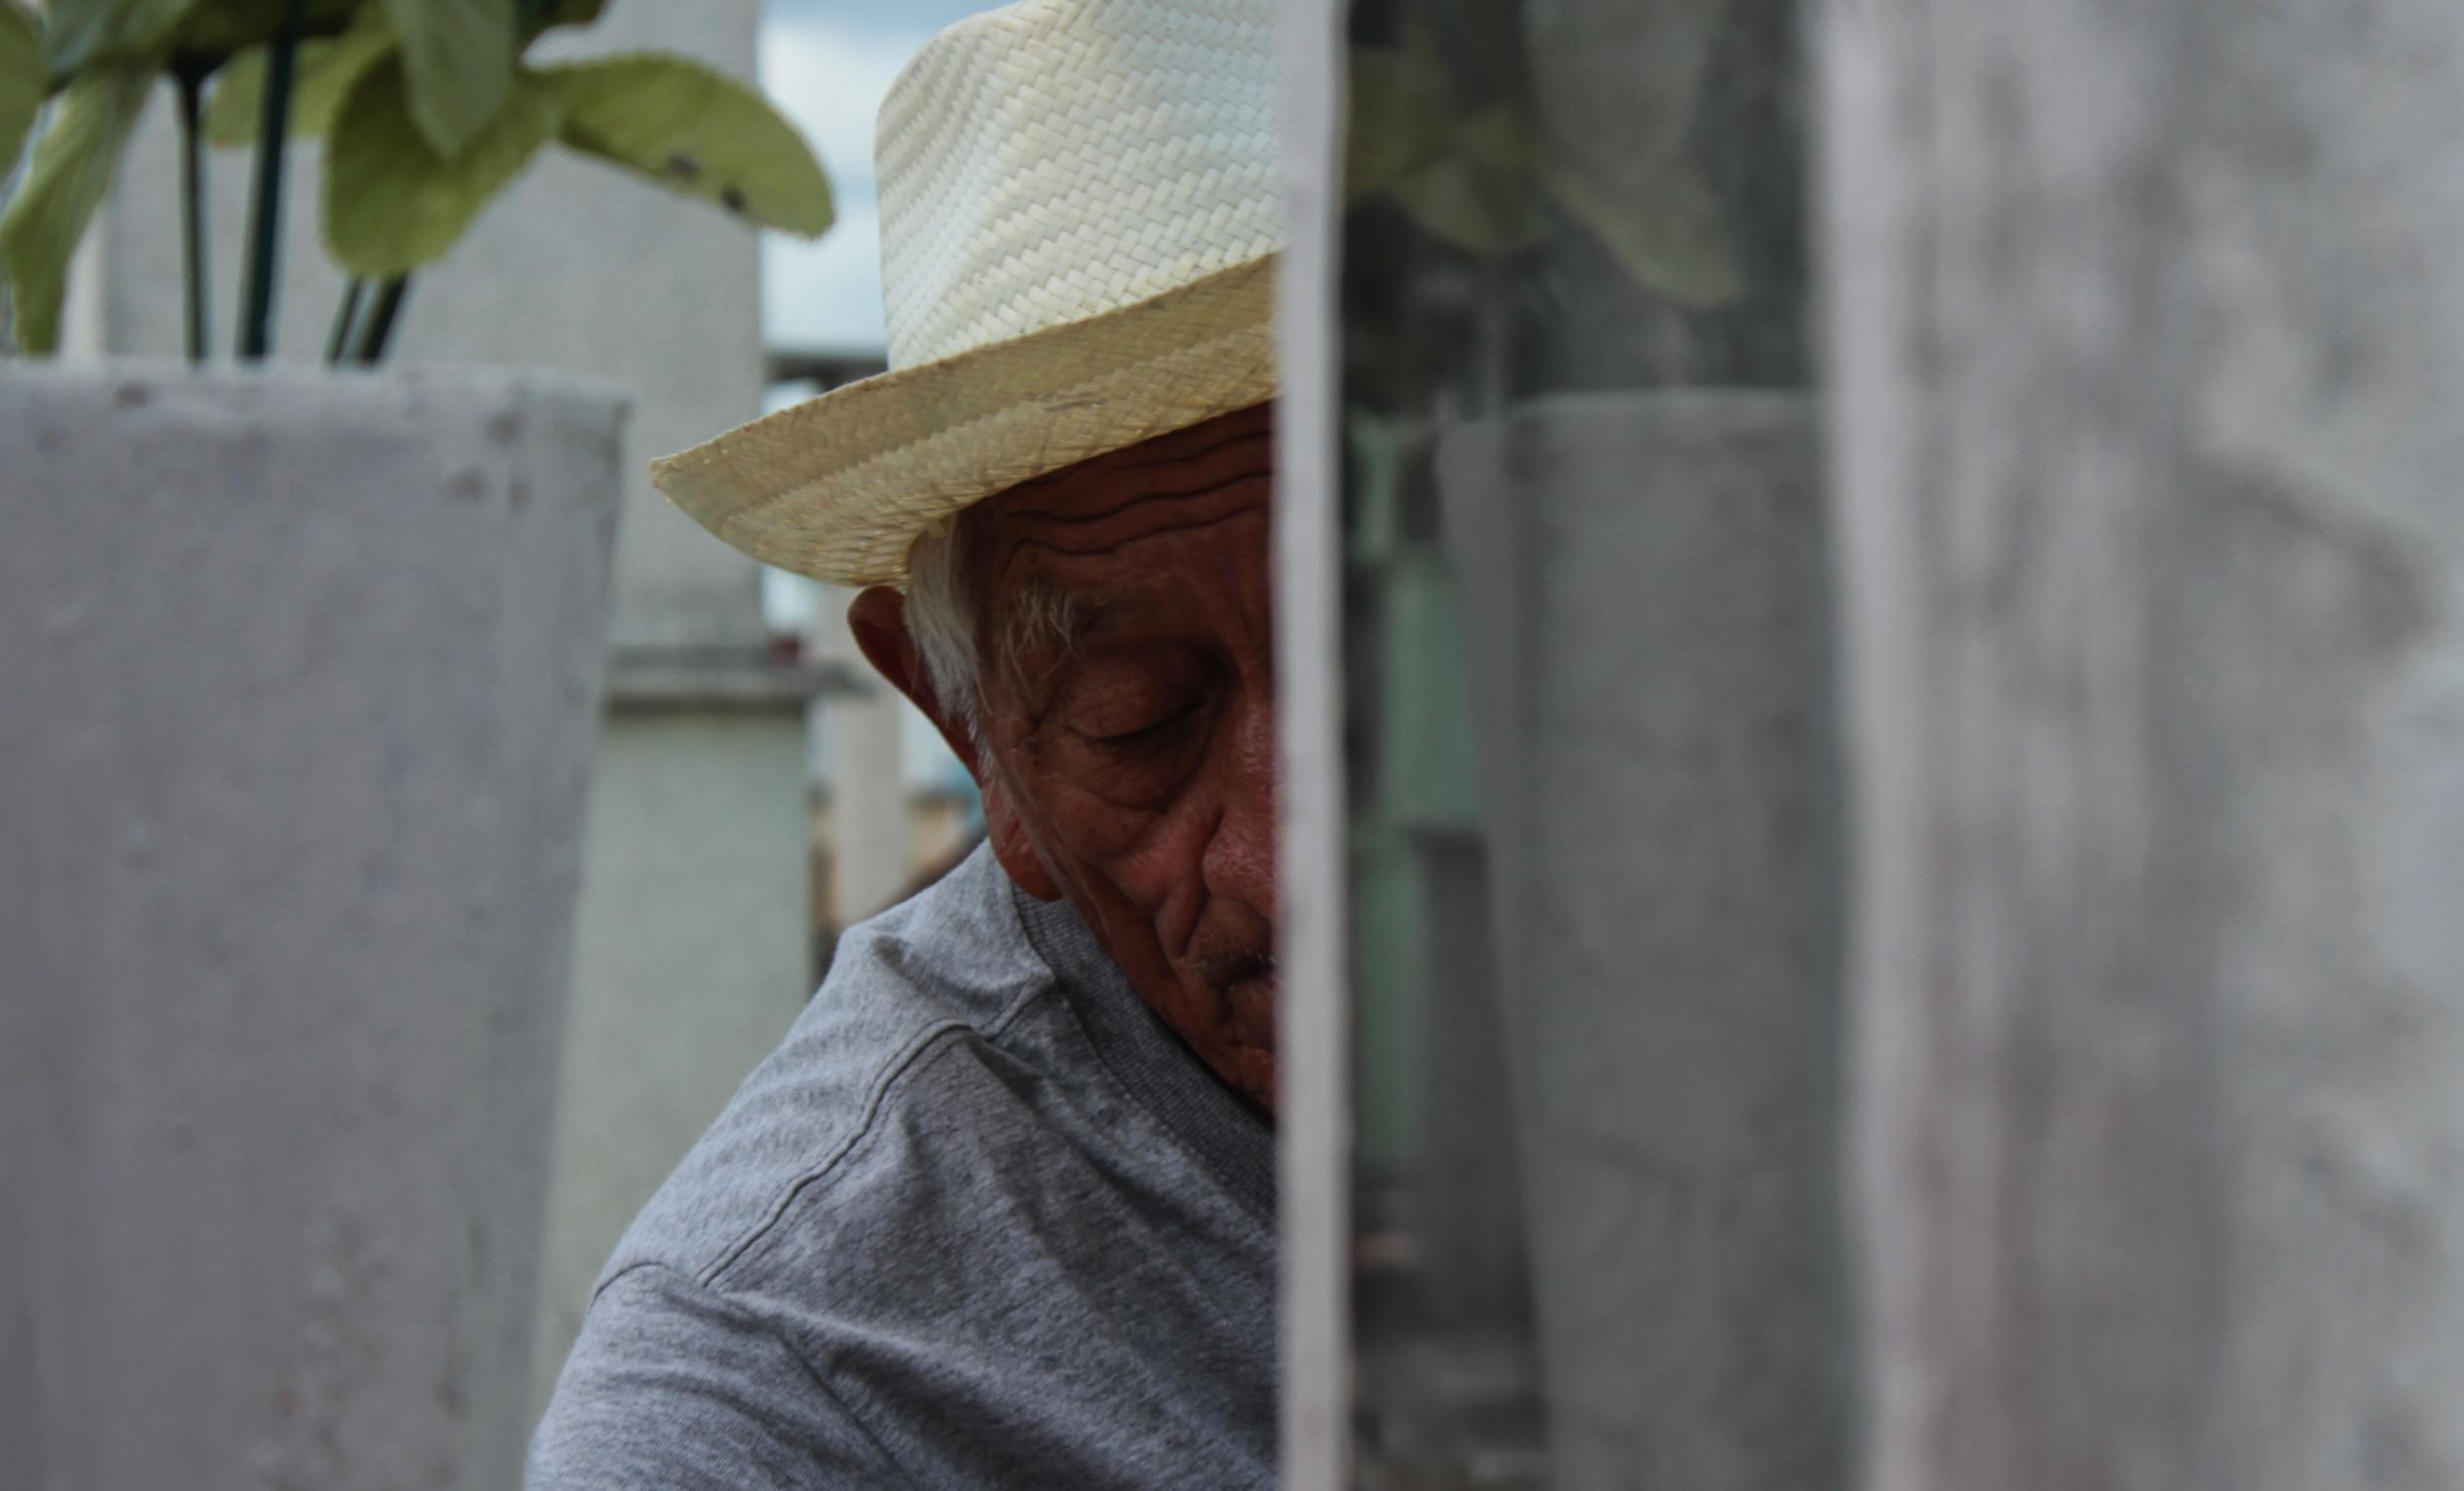 Historia de Día de Muertos: Don <i>Pil</i>, jardinero del panteón (video)